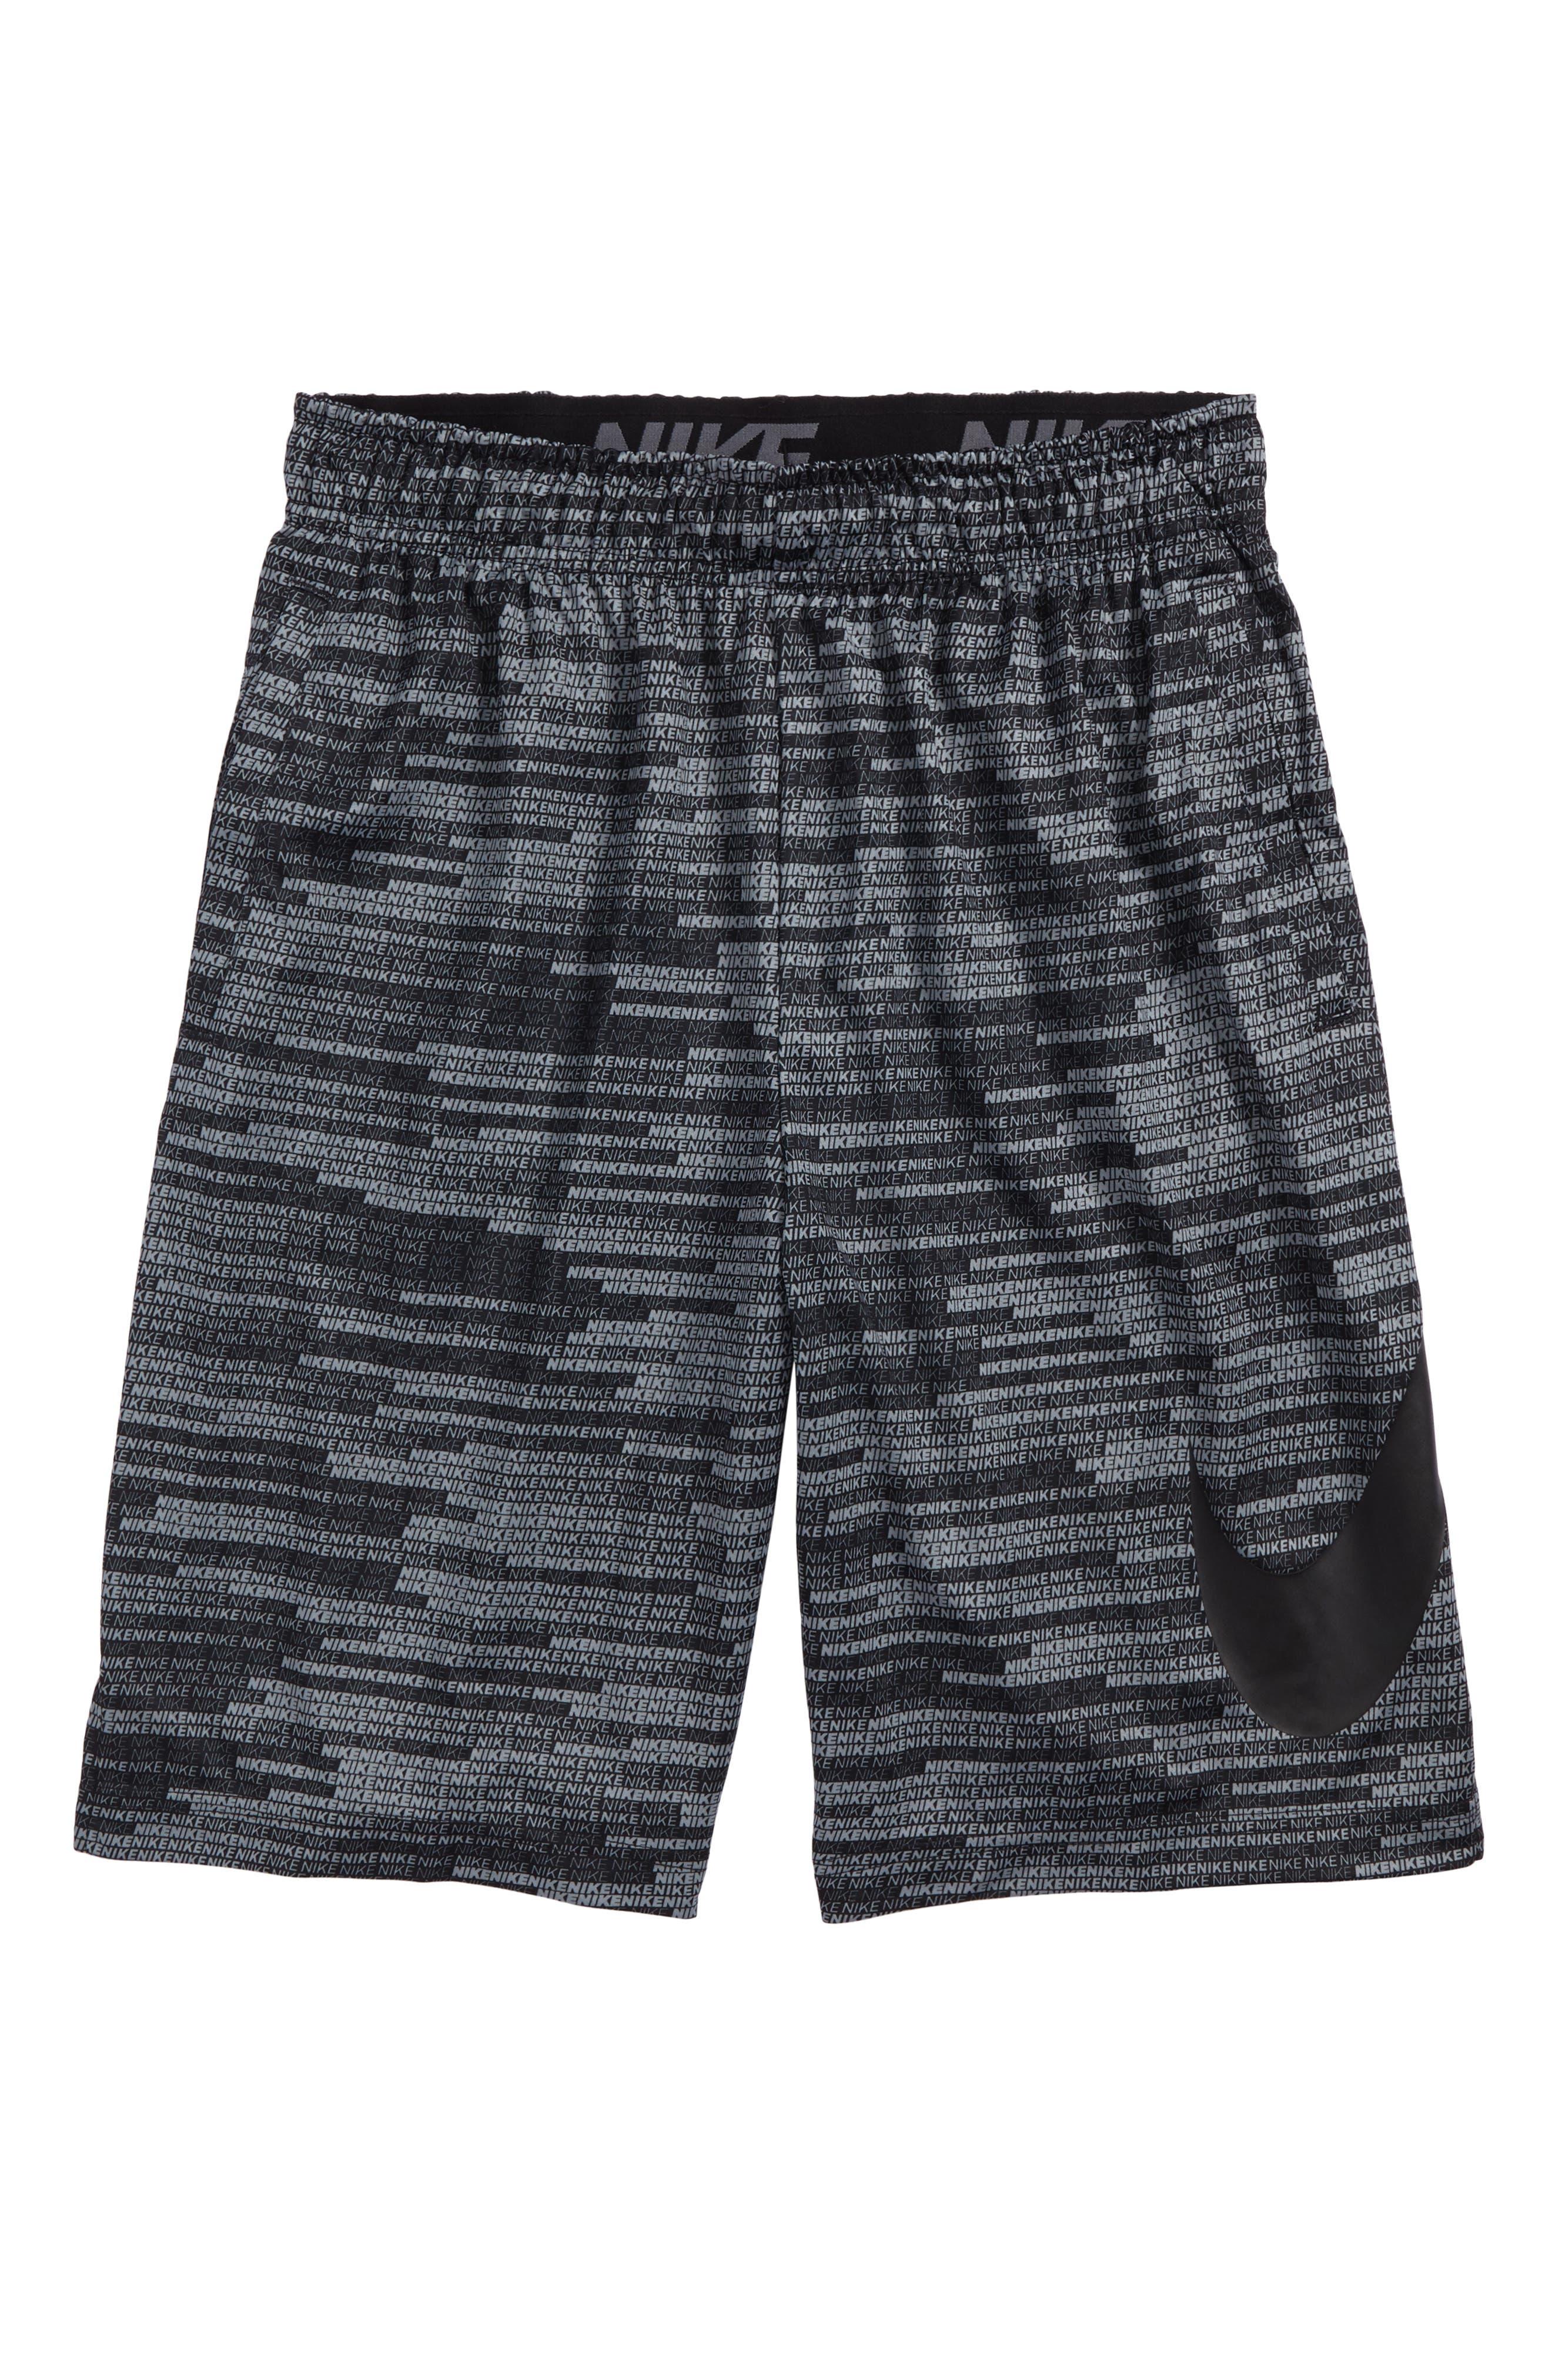 Dry Training Shorts,                         Main,                         color,